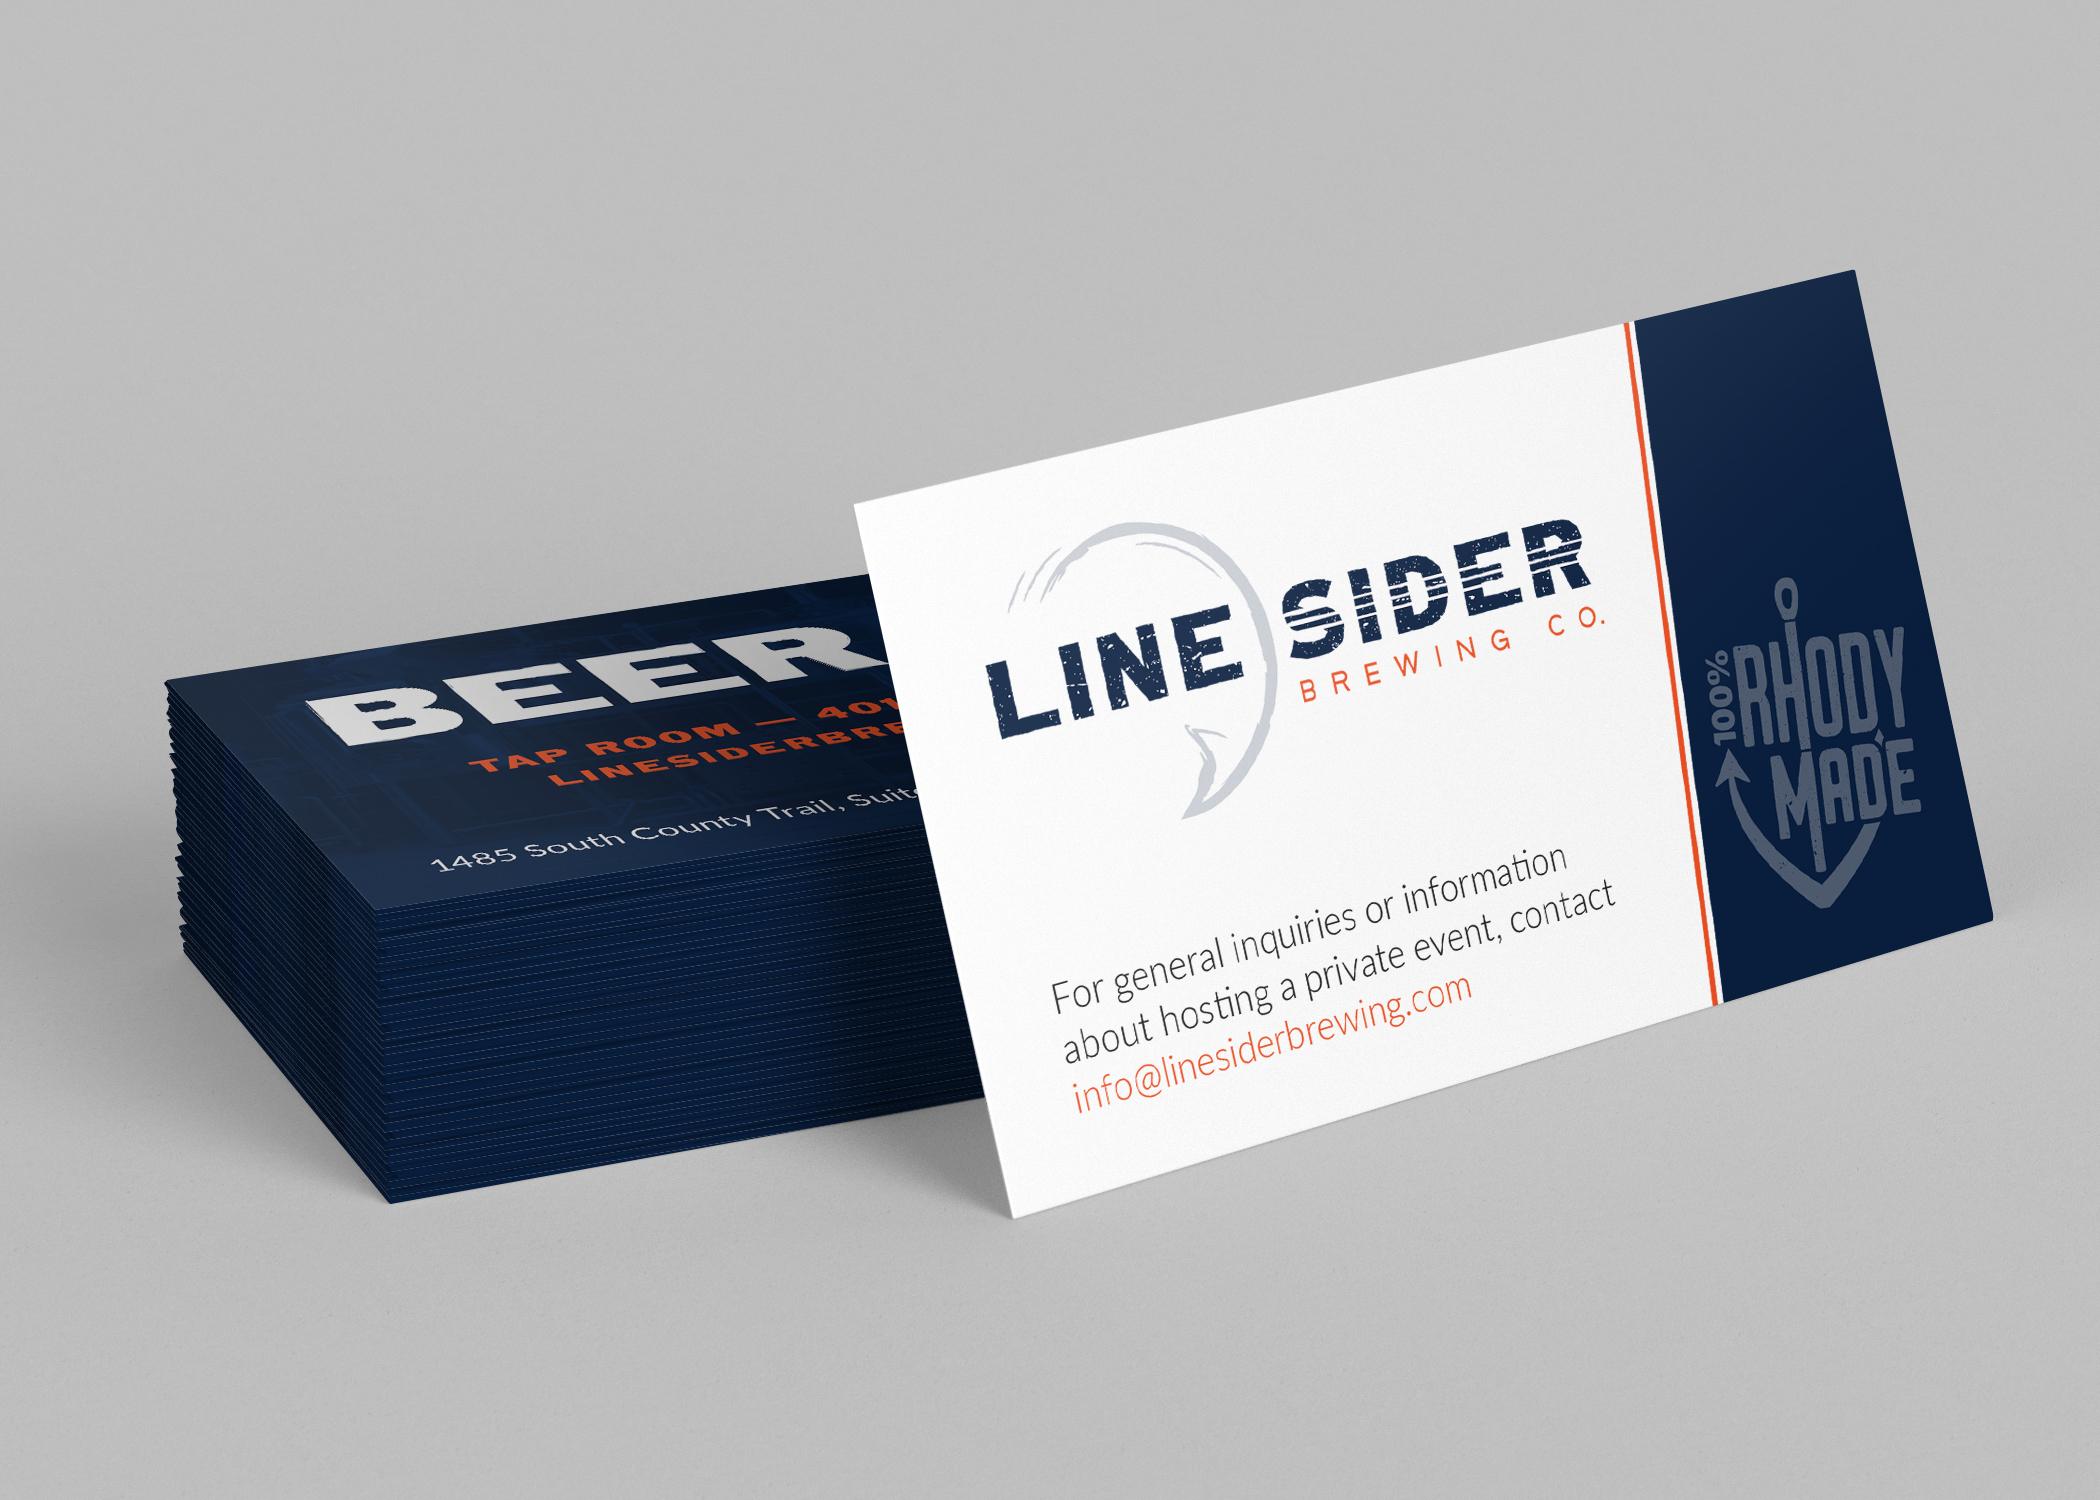 LineSider Brewing